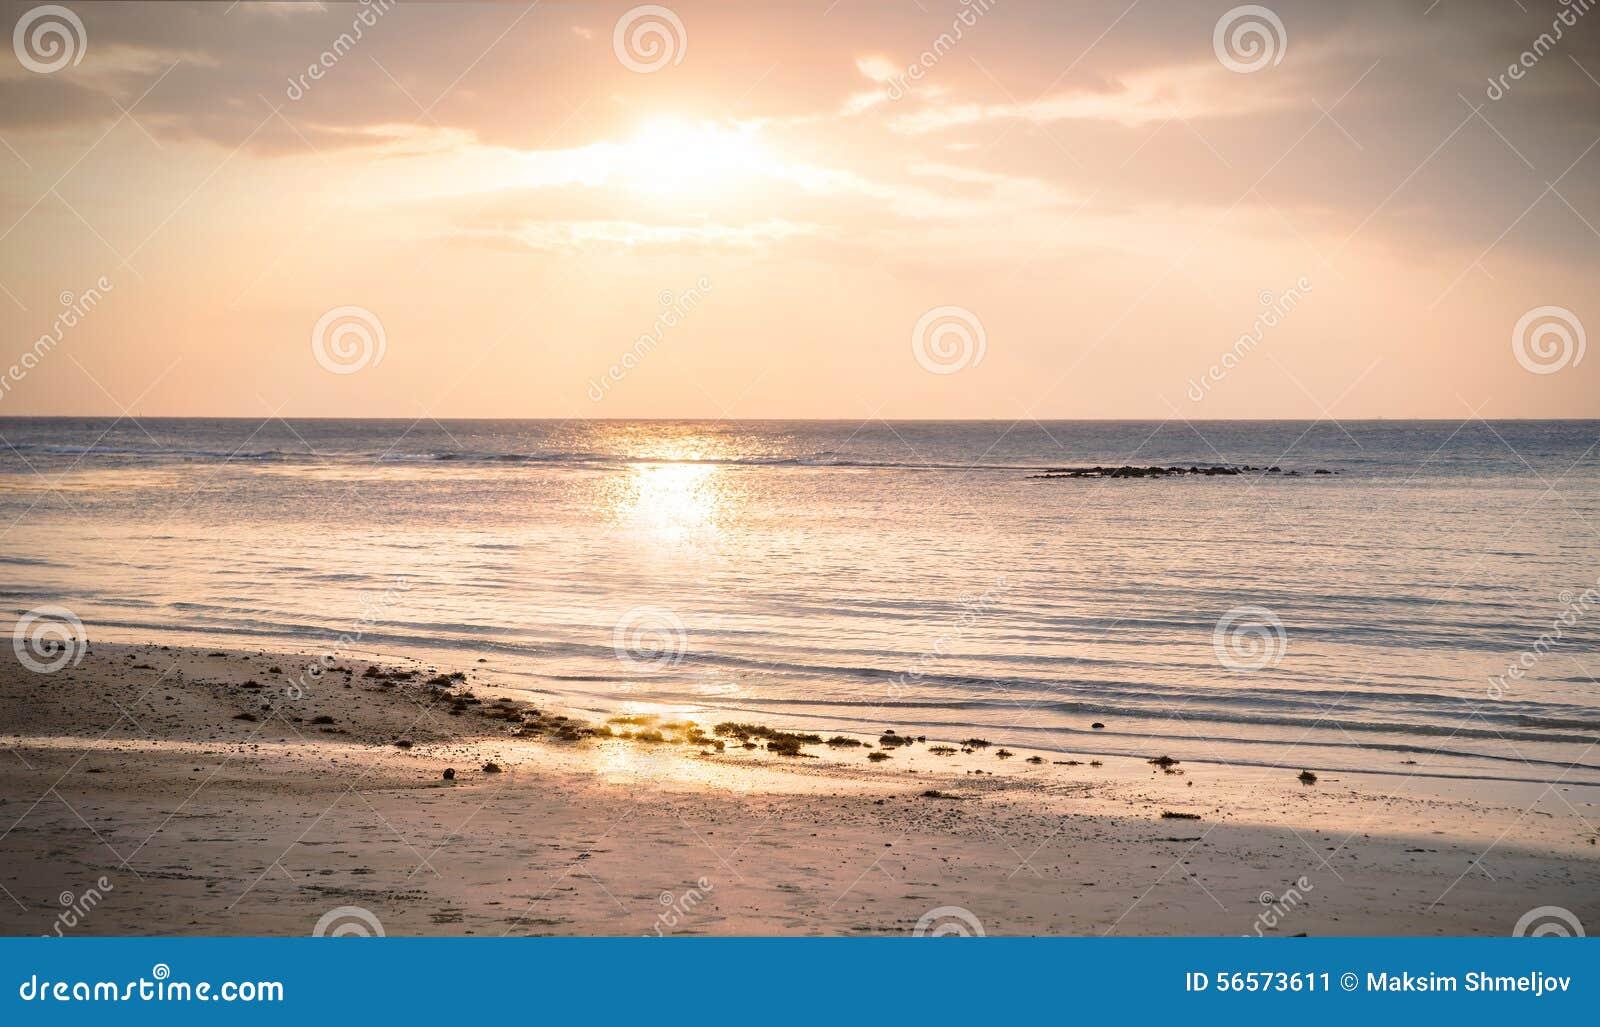 Download Όμορφη άποψη του ηλιοβασιλέματος στην παραλία Στοκ Εικόνα - εικόνα από τοπίο, ασία: 56573611